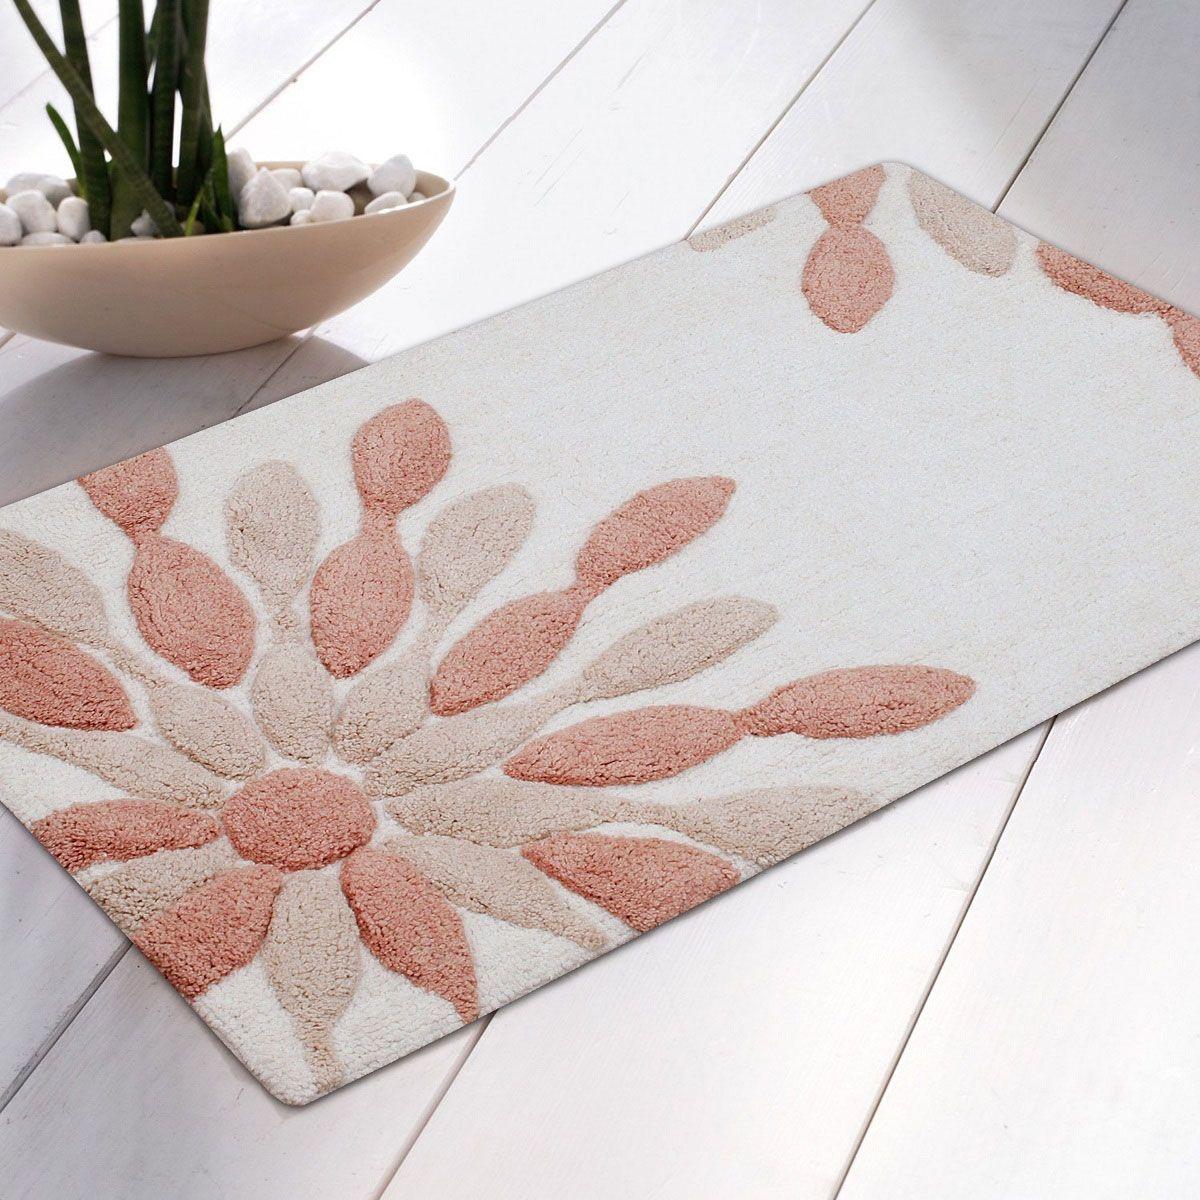 Peach Colored Bathroom Rugs Bathroom Ideas Pinterest Peach - Orange bath mat set for bathroom decorating ideas